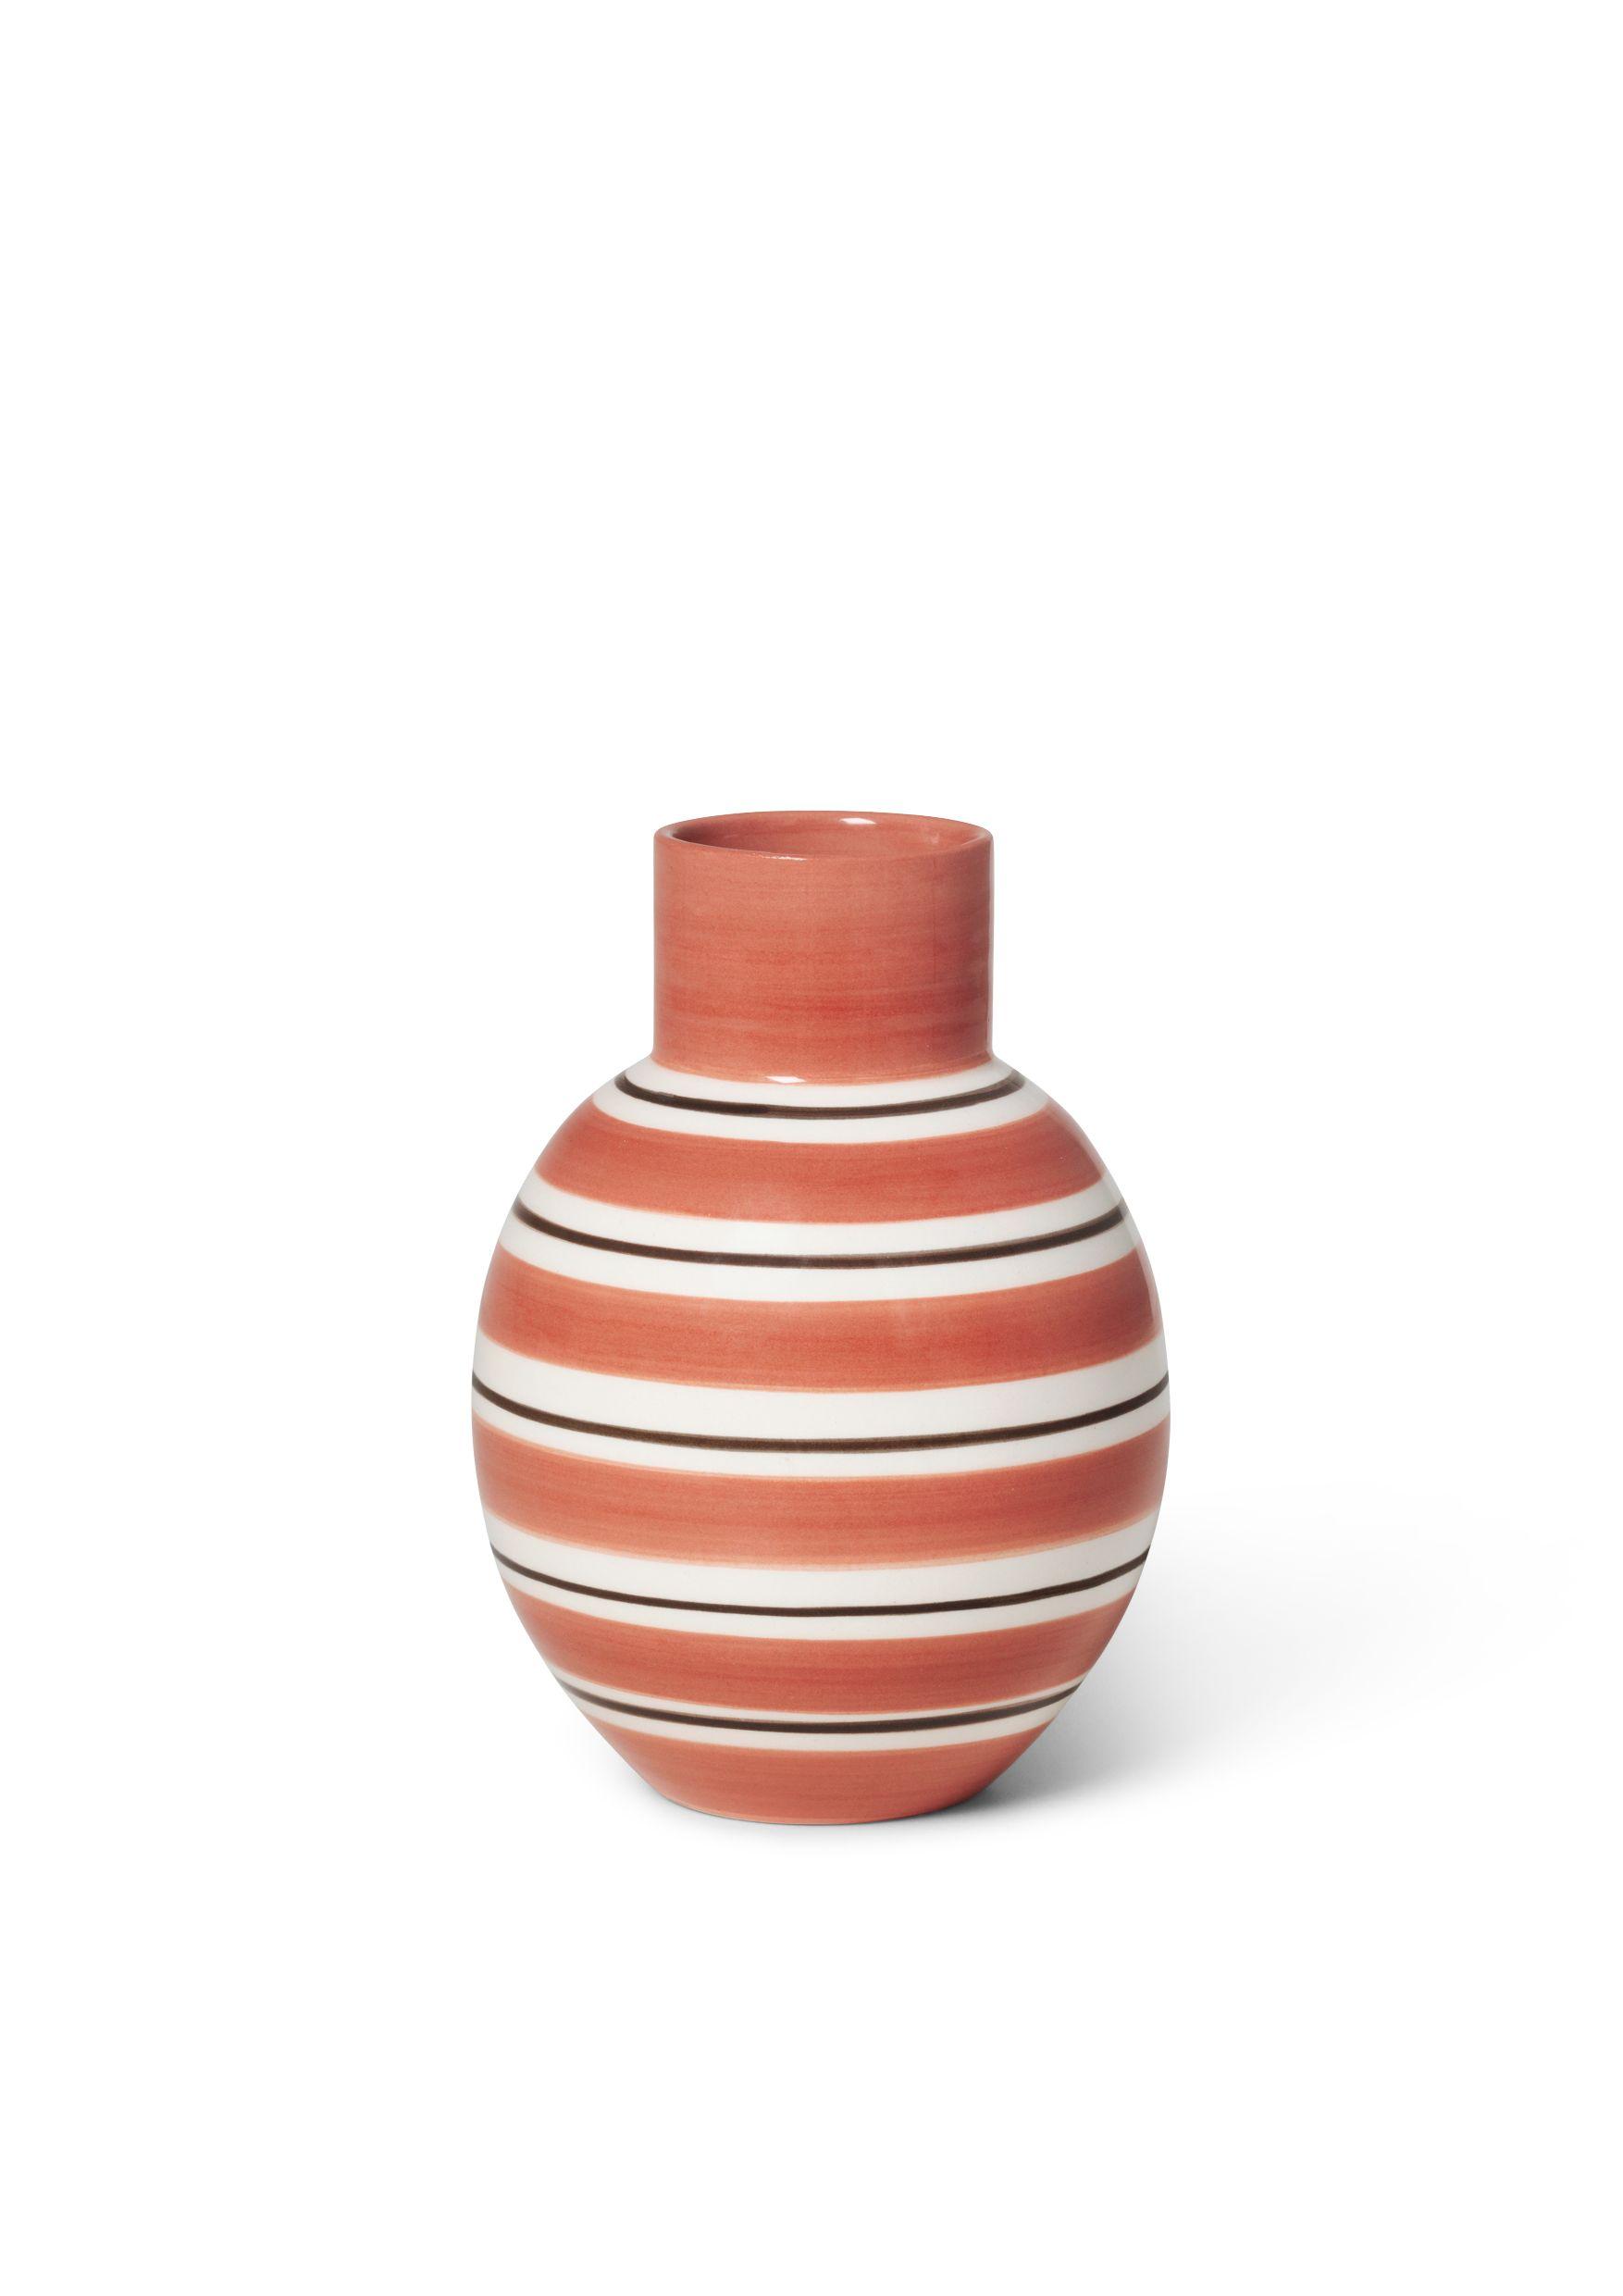 Kähler Omaggio Nuovo vase, H14,5 cm, terracotta